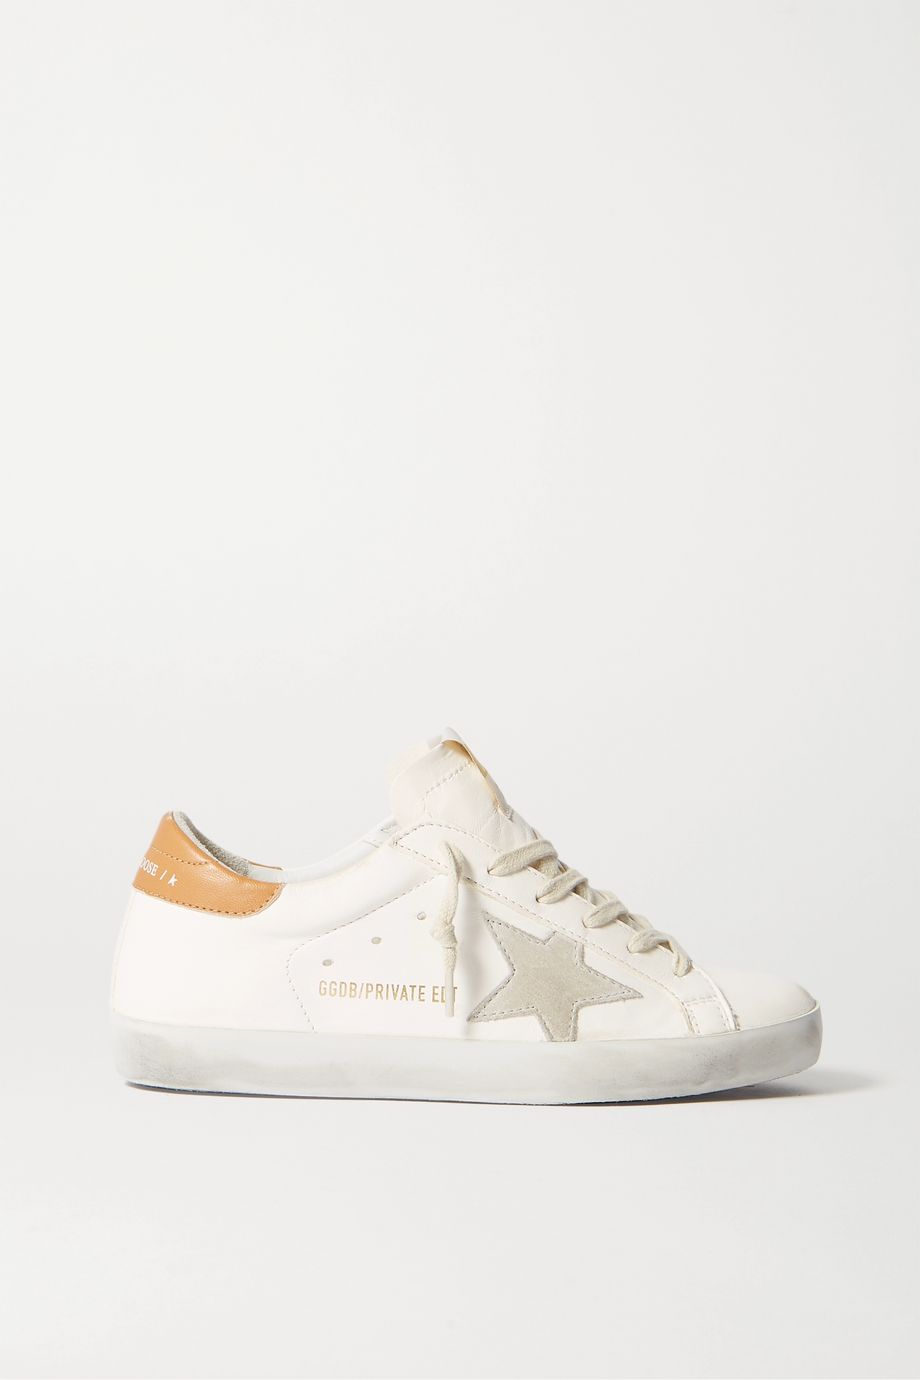 Golden Goose Superstar 仿旧皮革运动鞋